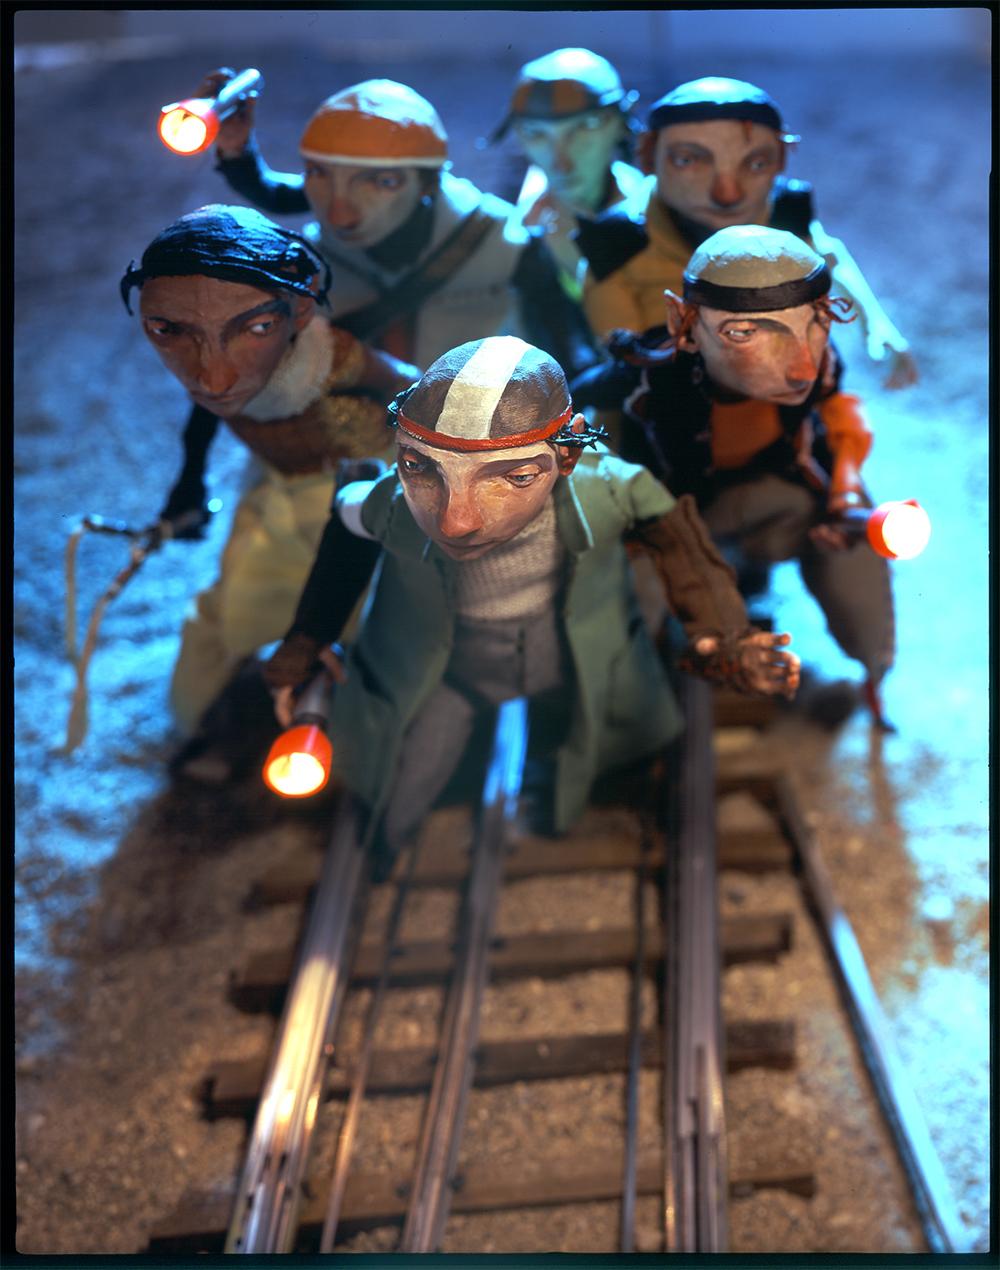 SOI 48 2005 - ARTIST: Red Nose StudioTITLE: Borribles Train TracksCLIENT: TOR Books